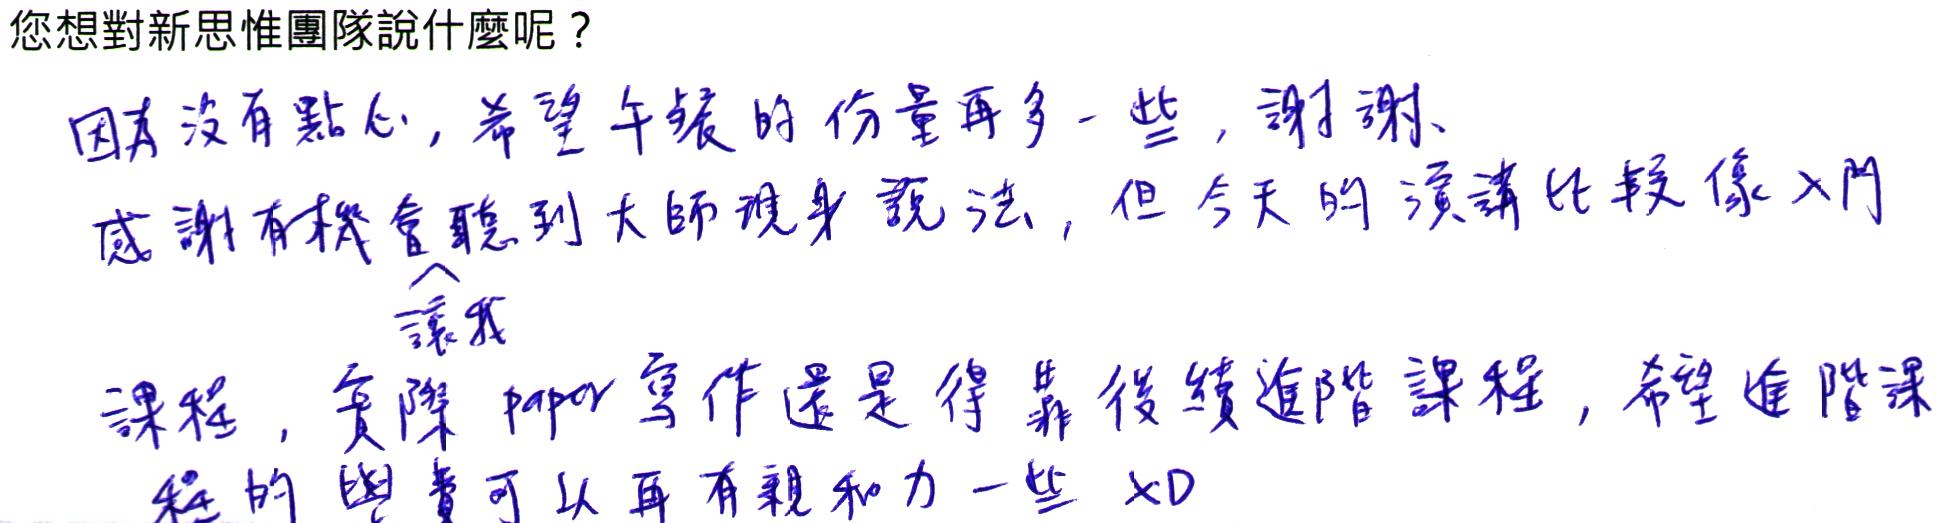 20170924_YMRF_feedback_00018